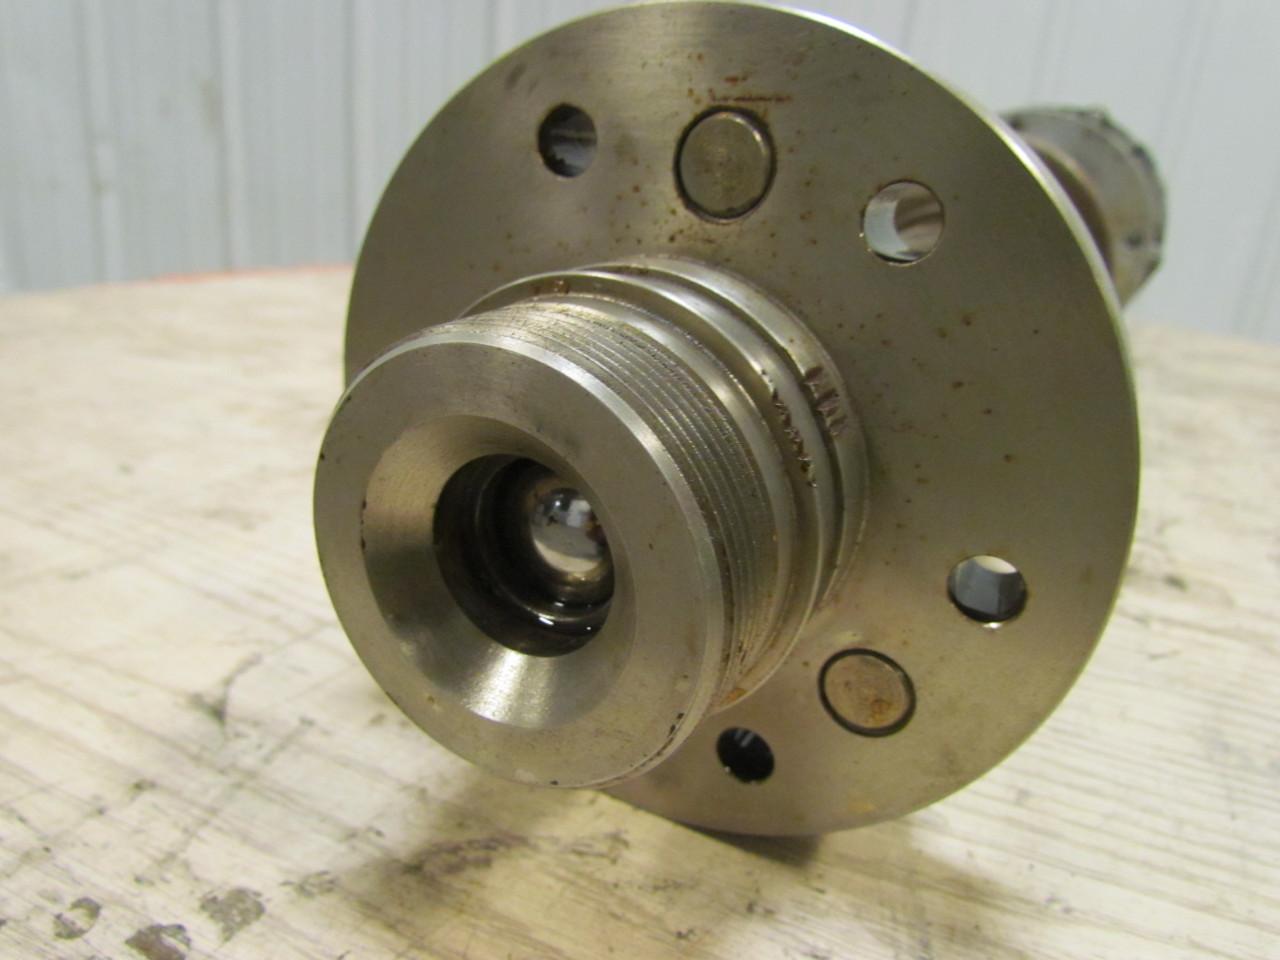 Aro 650646 R53 2 Ball Pump 6 Air Motor 20 1 Ratio 6